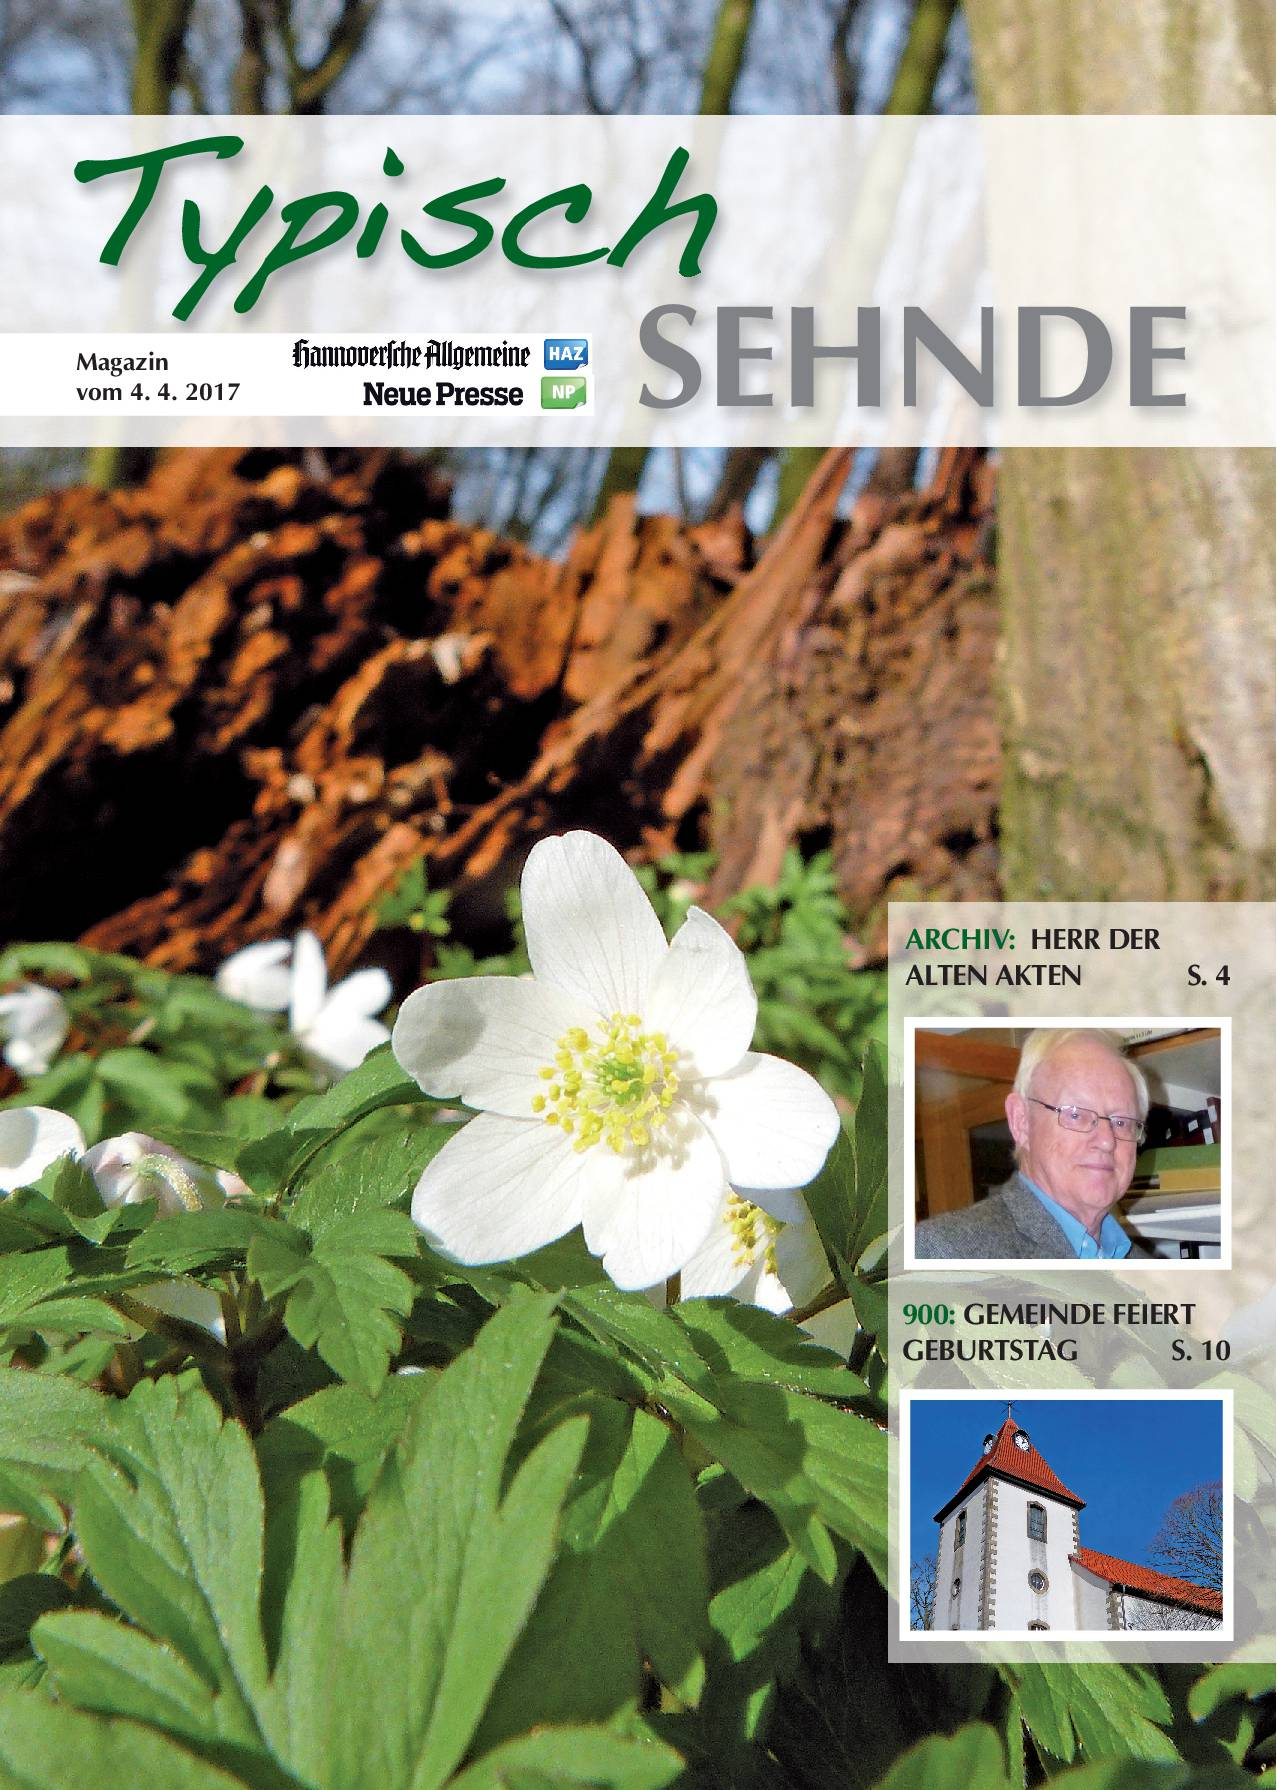 sehnde-nr-6-vom-04-04-2017